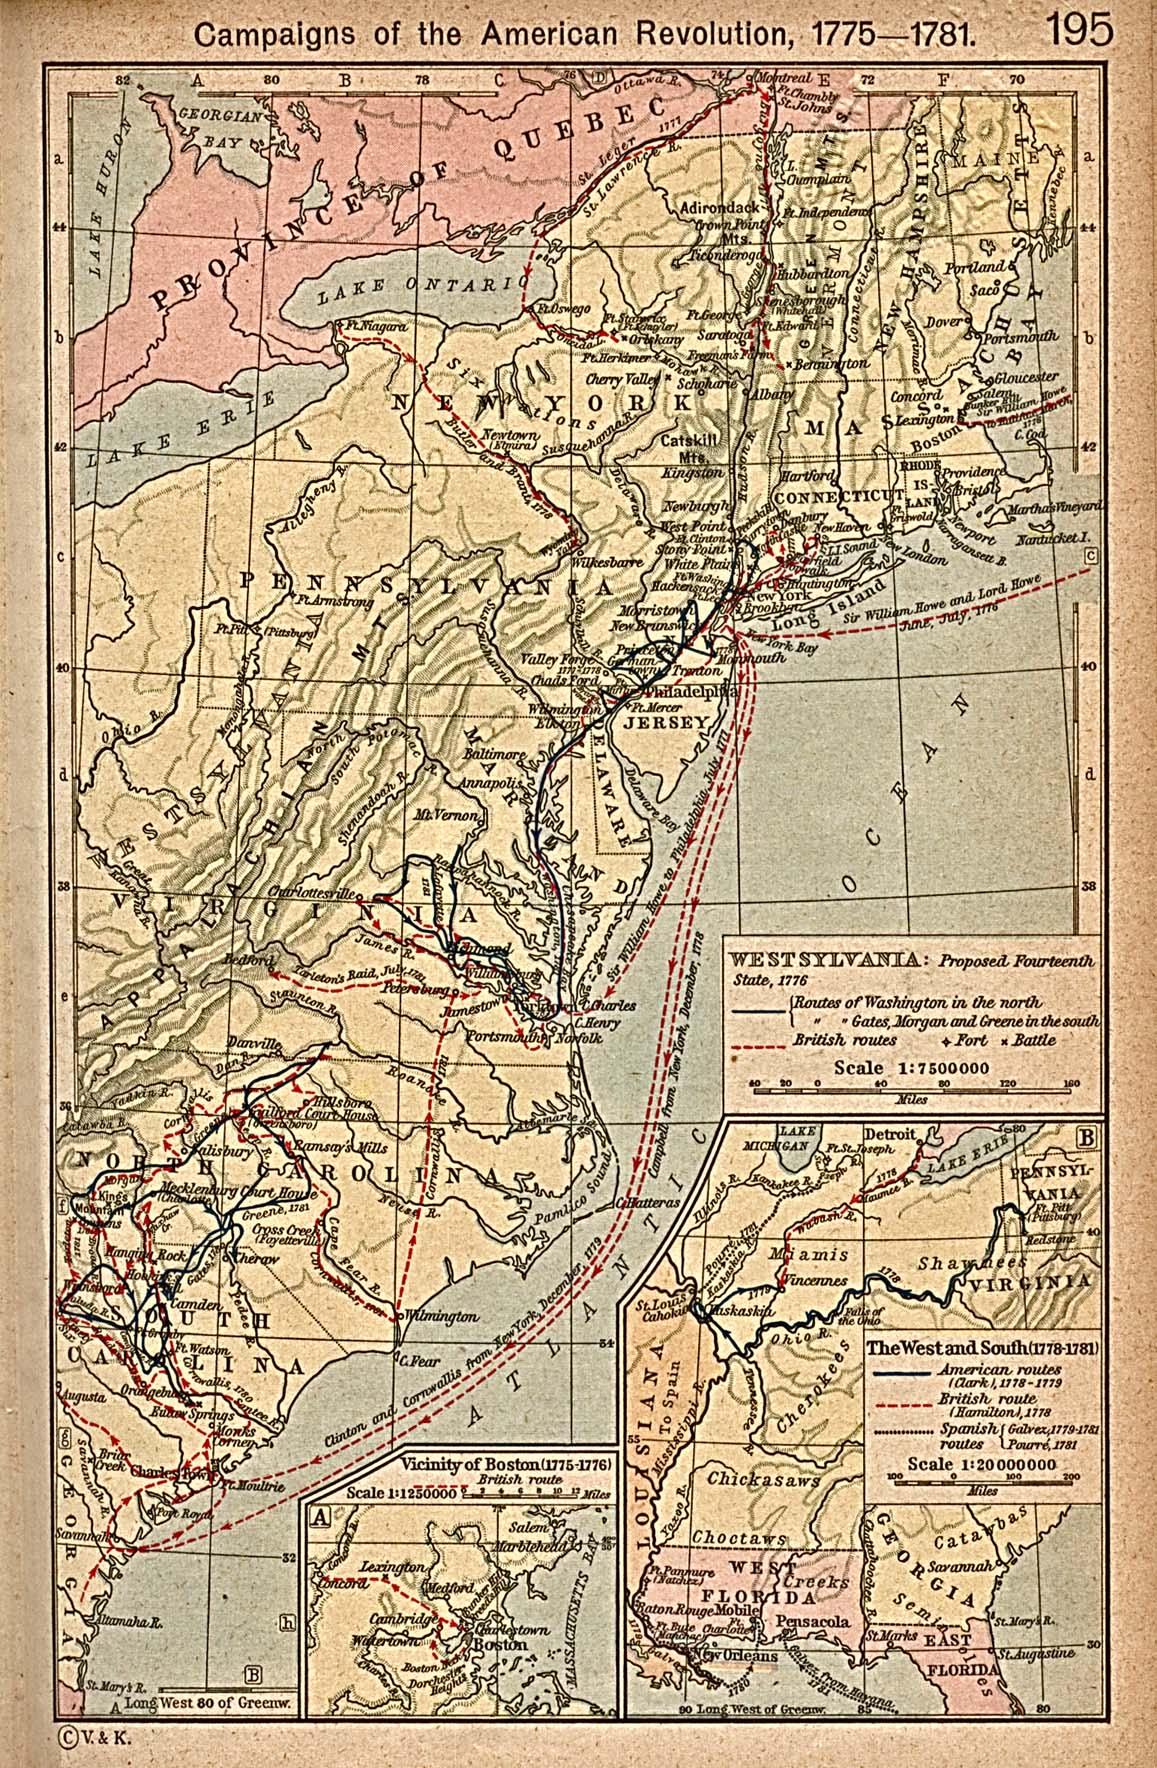 New York Map Revolutionary War